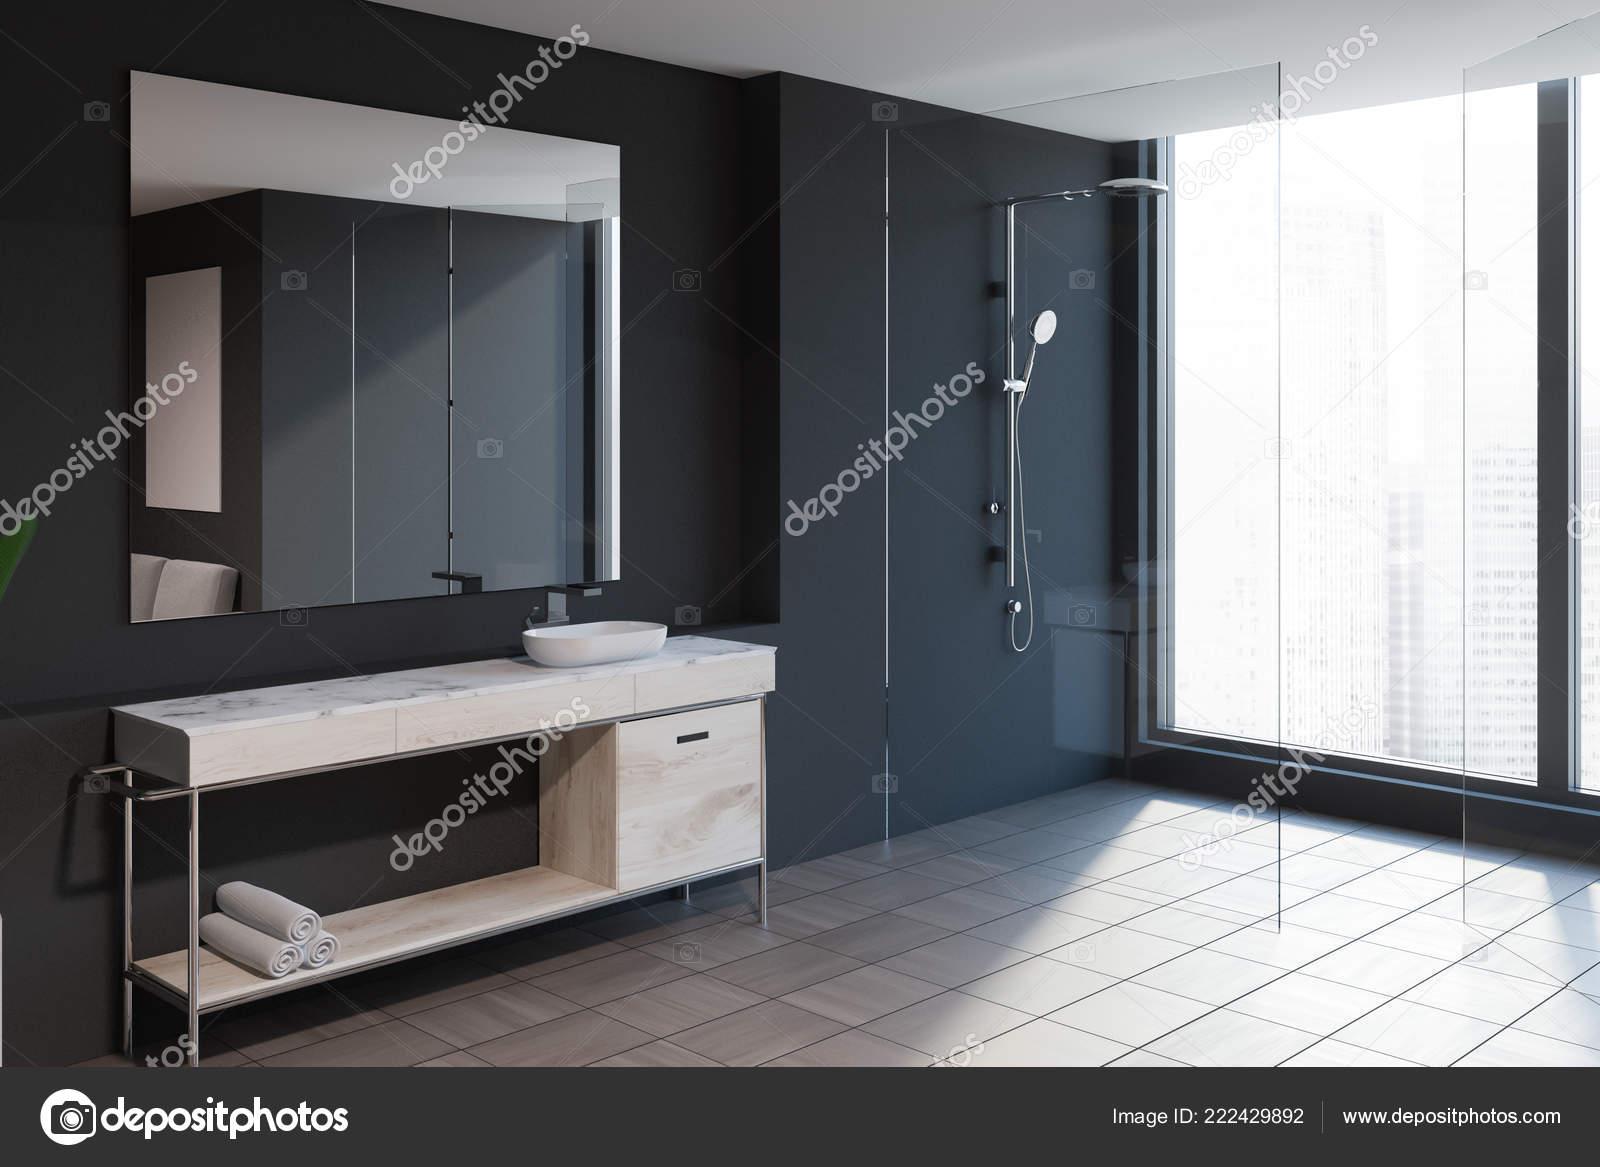 Vista Lateral Del Interior Cuarto Baño Moderno Con Paredes ...